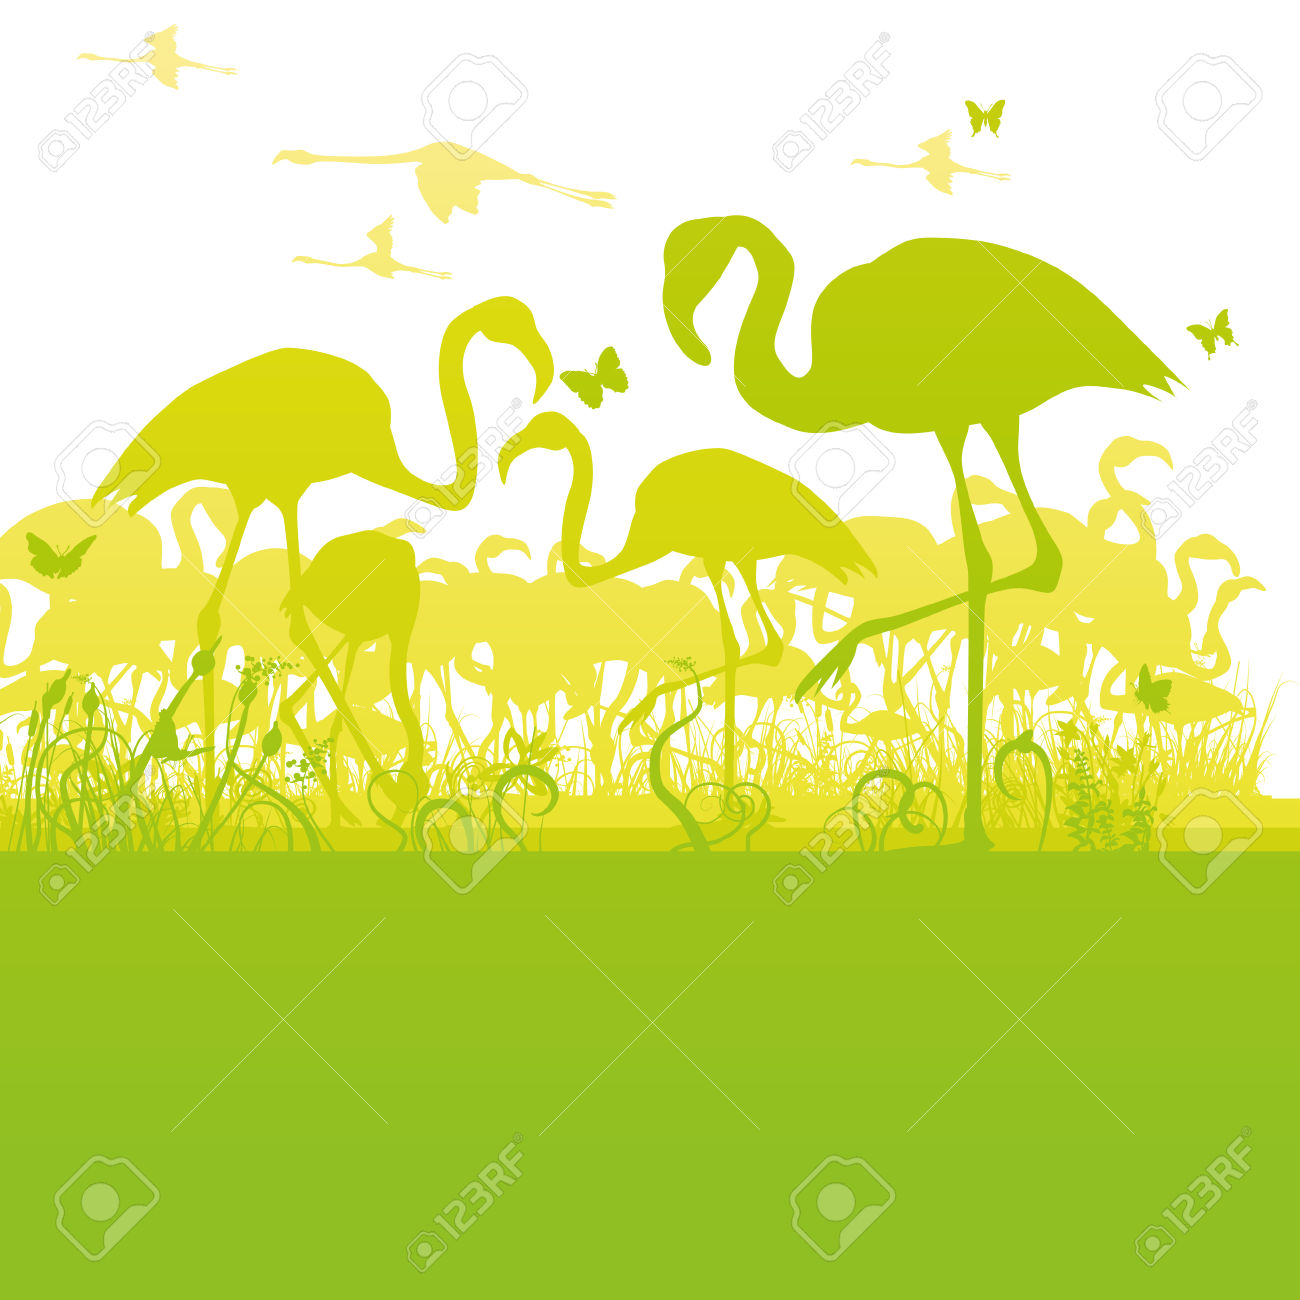 Flamingos At The Edge Of A Pond Royalty Free Cliparts, Vectors.